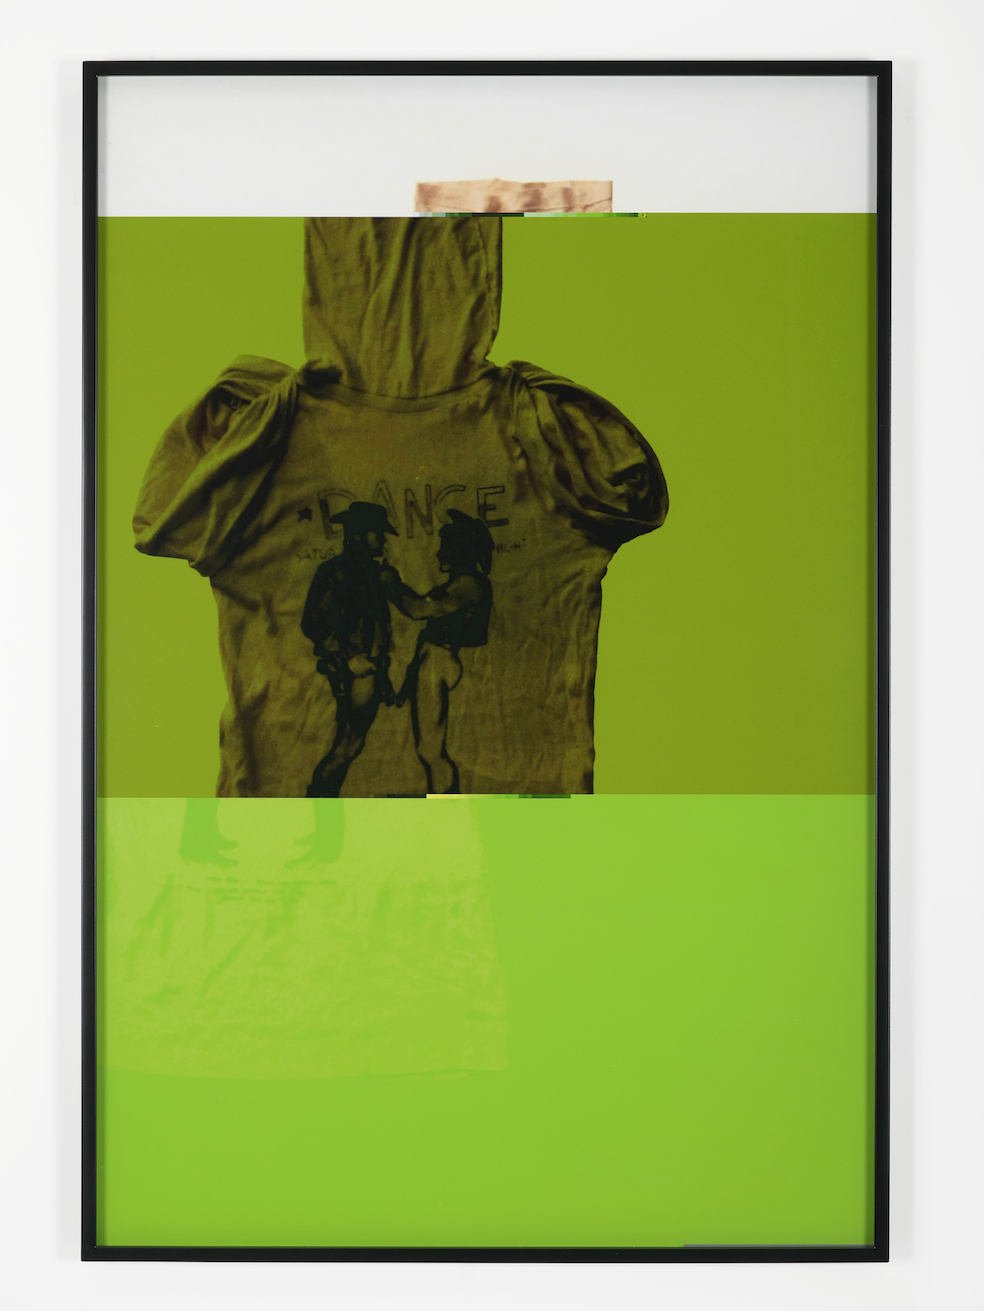 Nick Relph Alien Sauce 2014 Archival Pigment Print 106.6 x 71.1 cm / 42 x 28 in